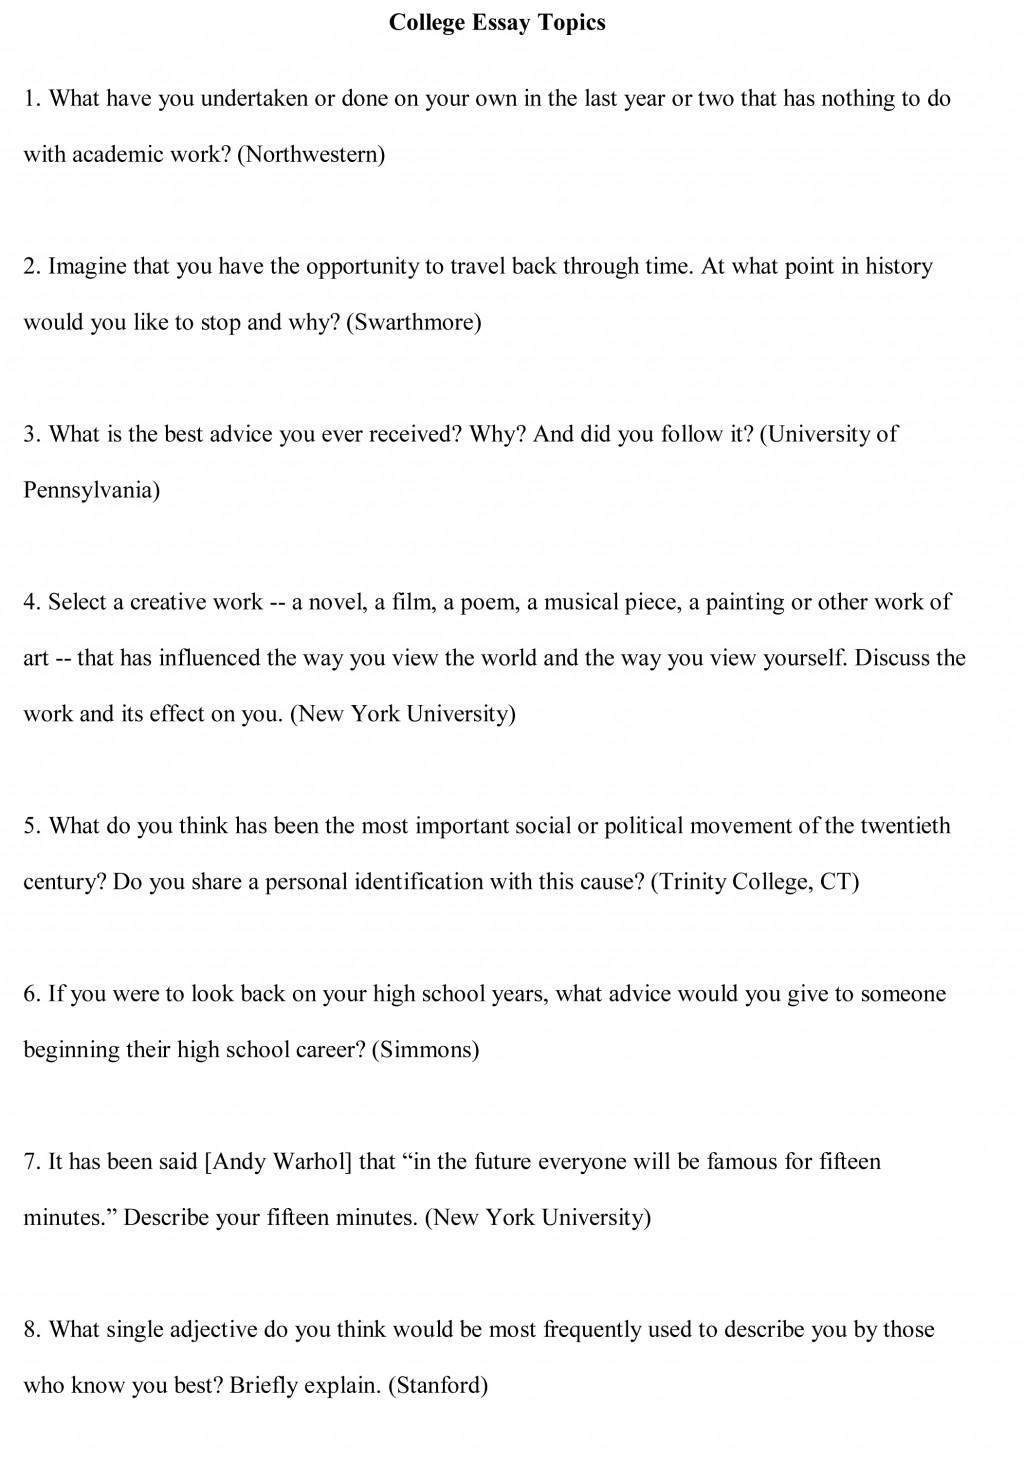 014 College Essay Topics Free Sample1 Generator Amazing Outline Idea Large